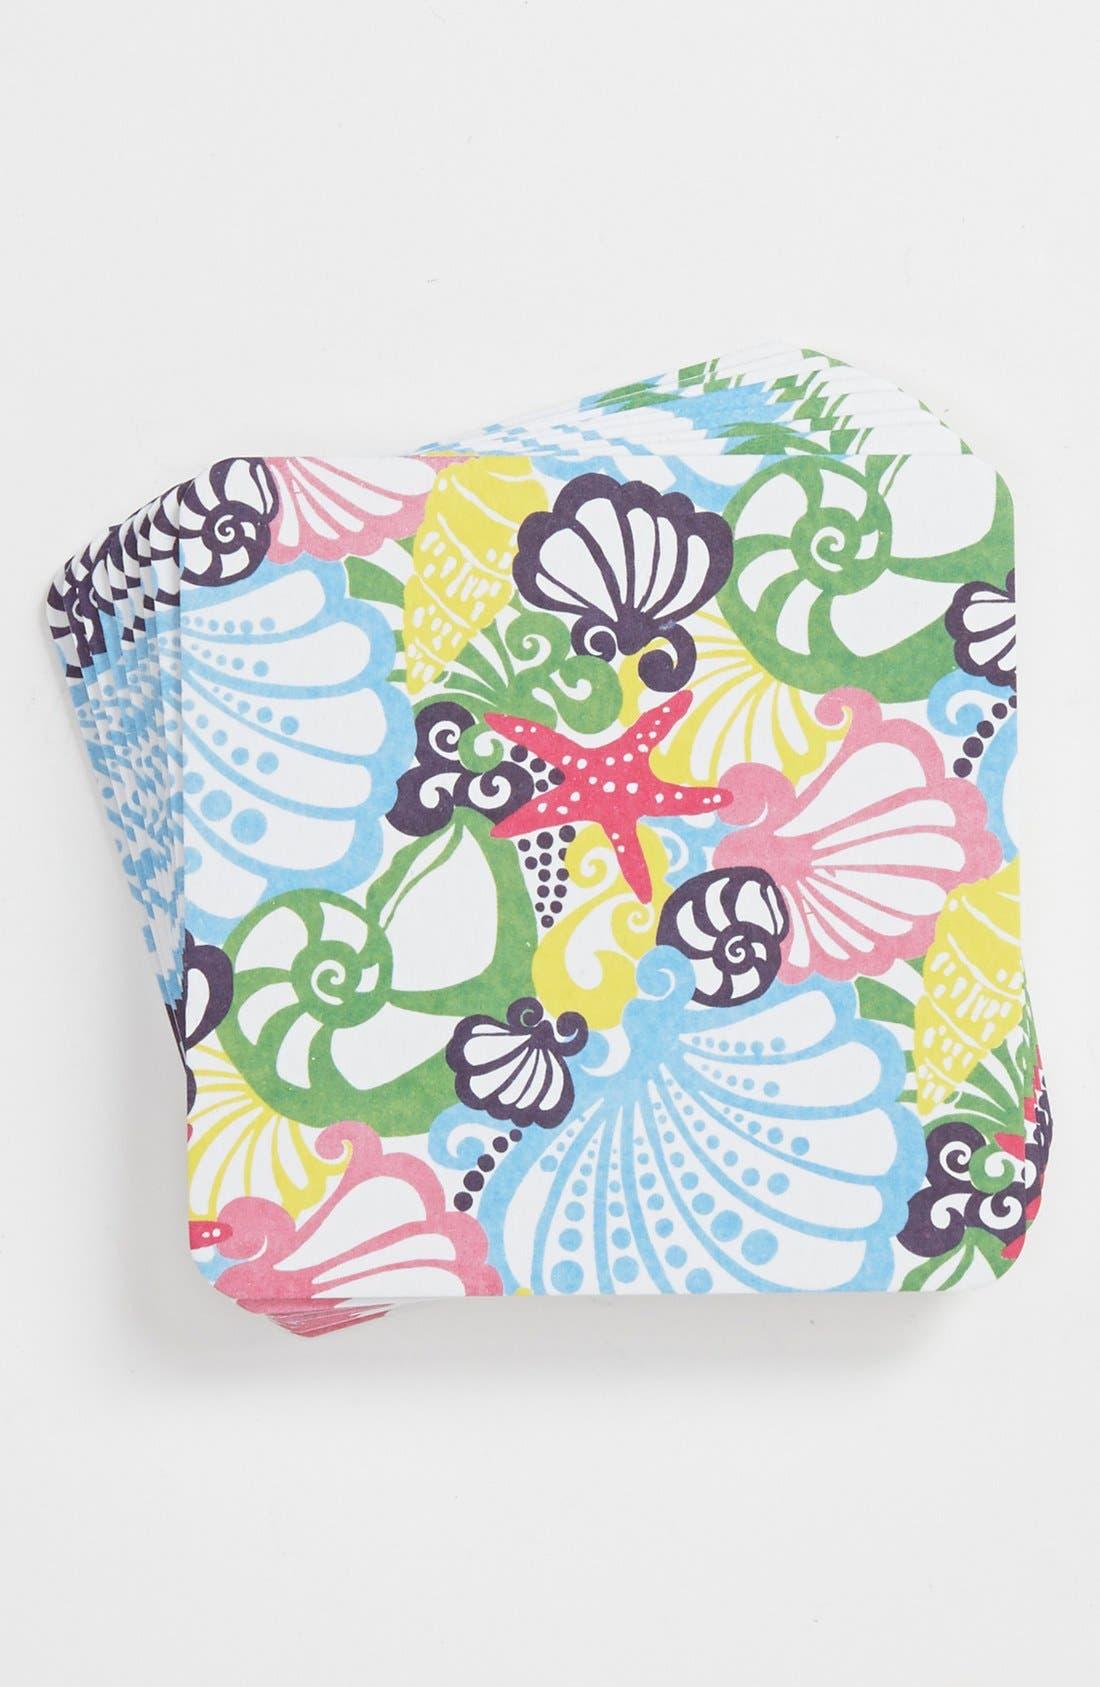 Main Image - Lilly Pulitzer® 'Drink Up, Buttercup! - Chiquita Bonita' Paper Coasters (Set of 24)